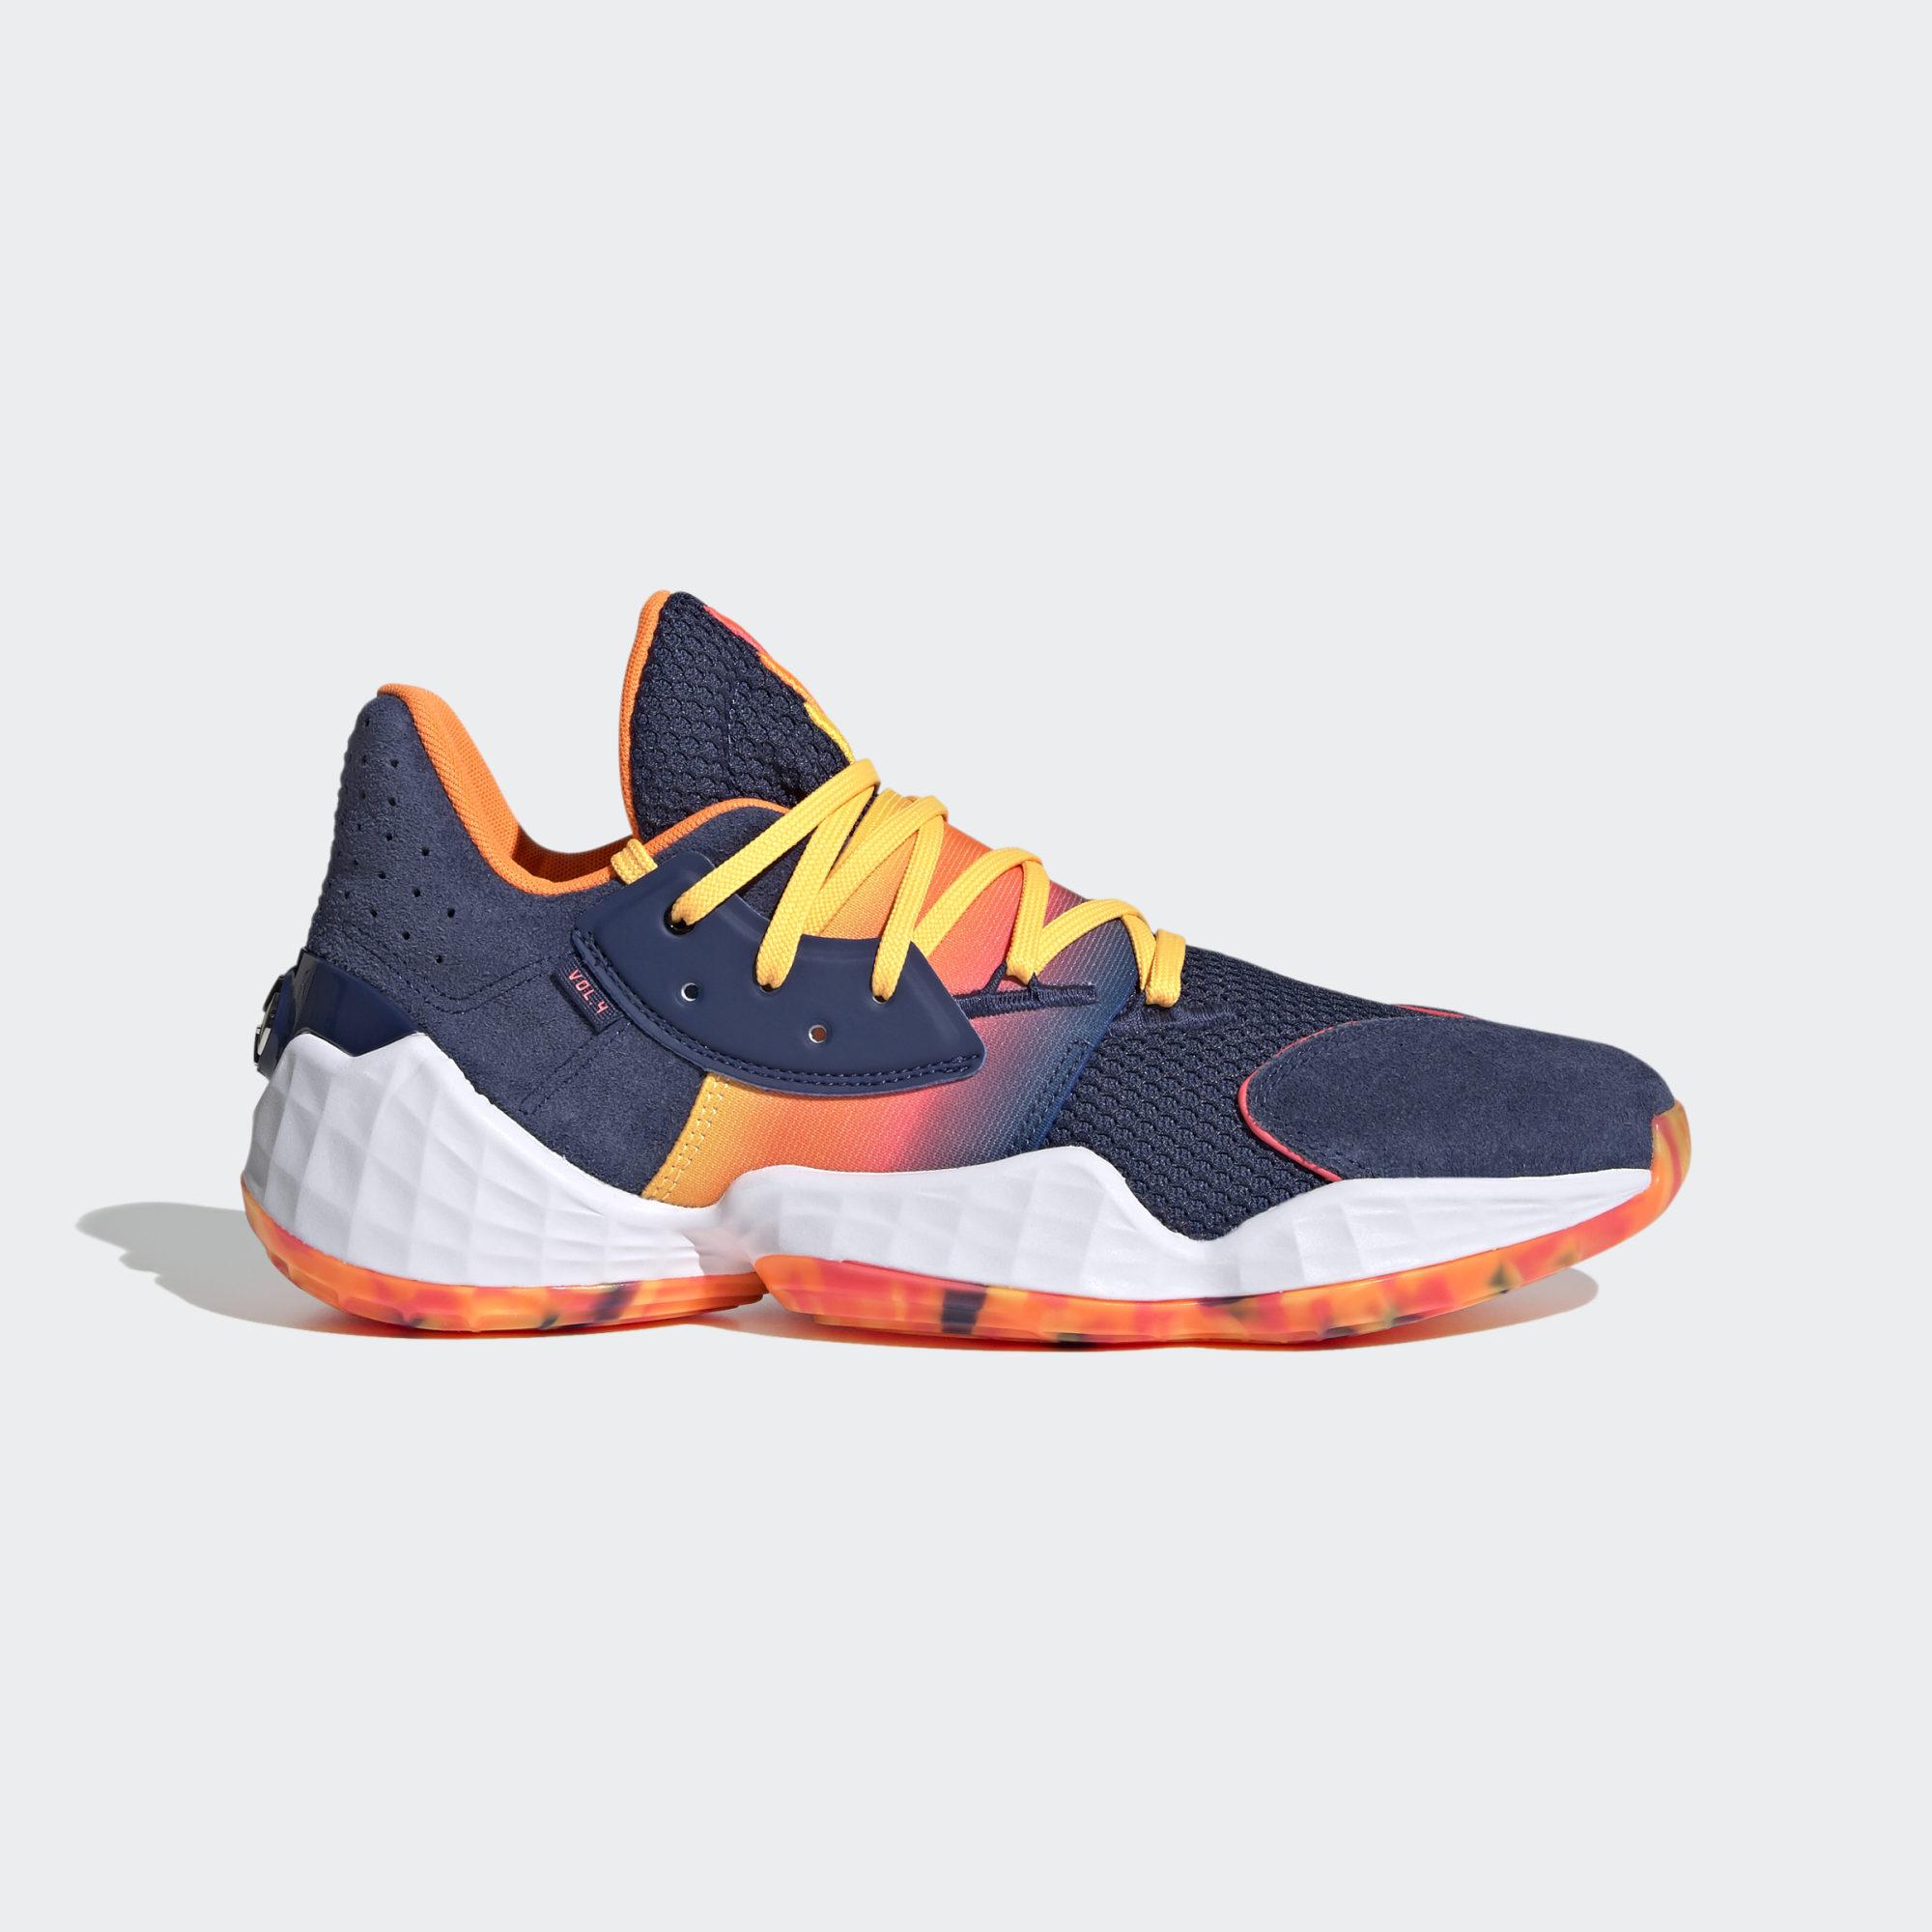 Migliori scarpe da basket 2021: la guida definitiva - NBARELIGION.COM